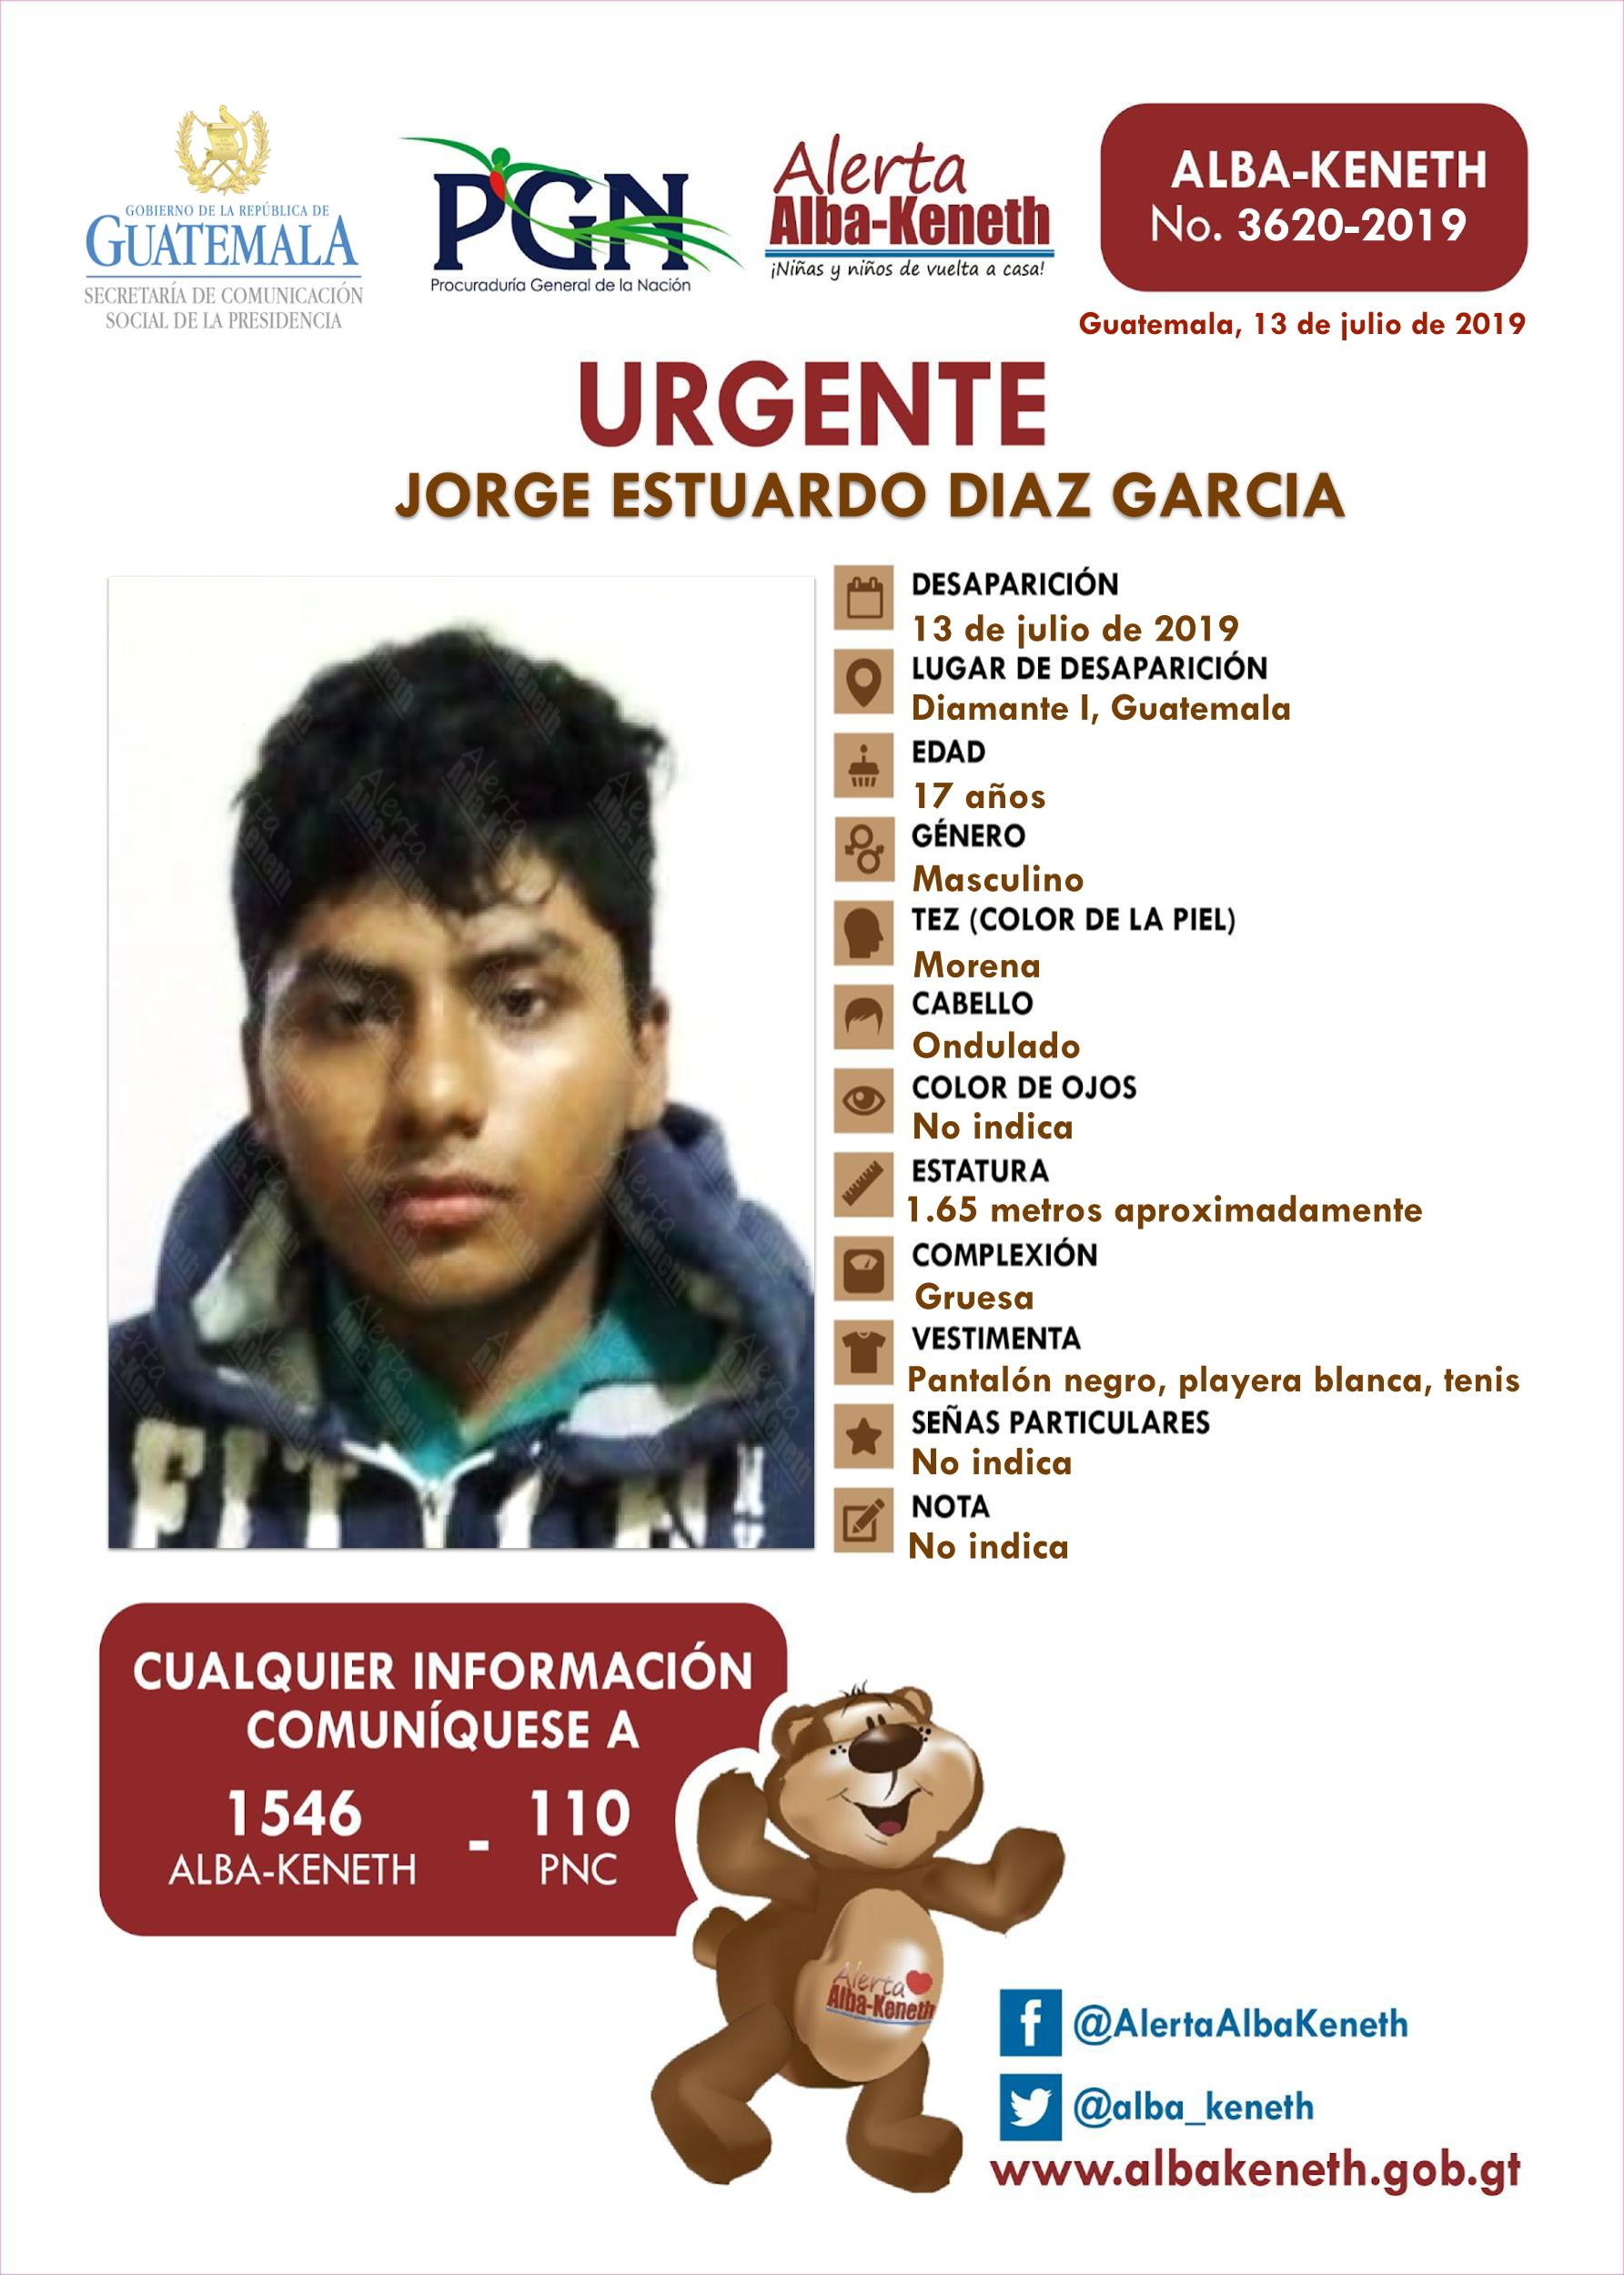 Jorge Estuardo Diaz Garcia